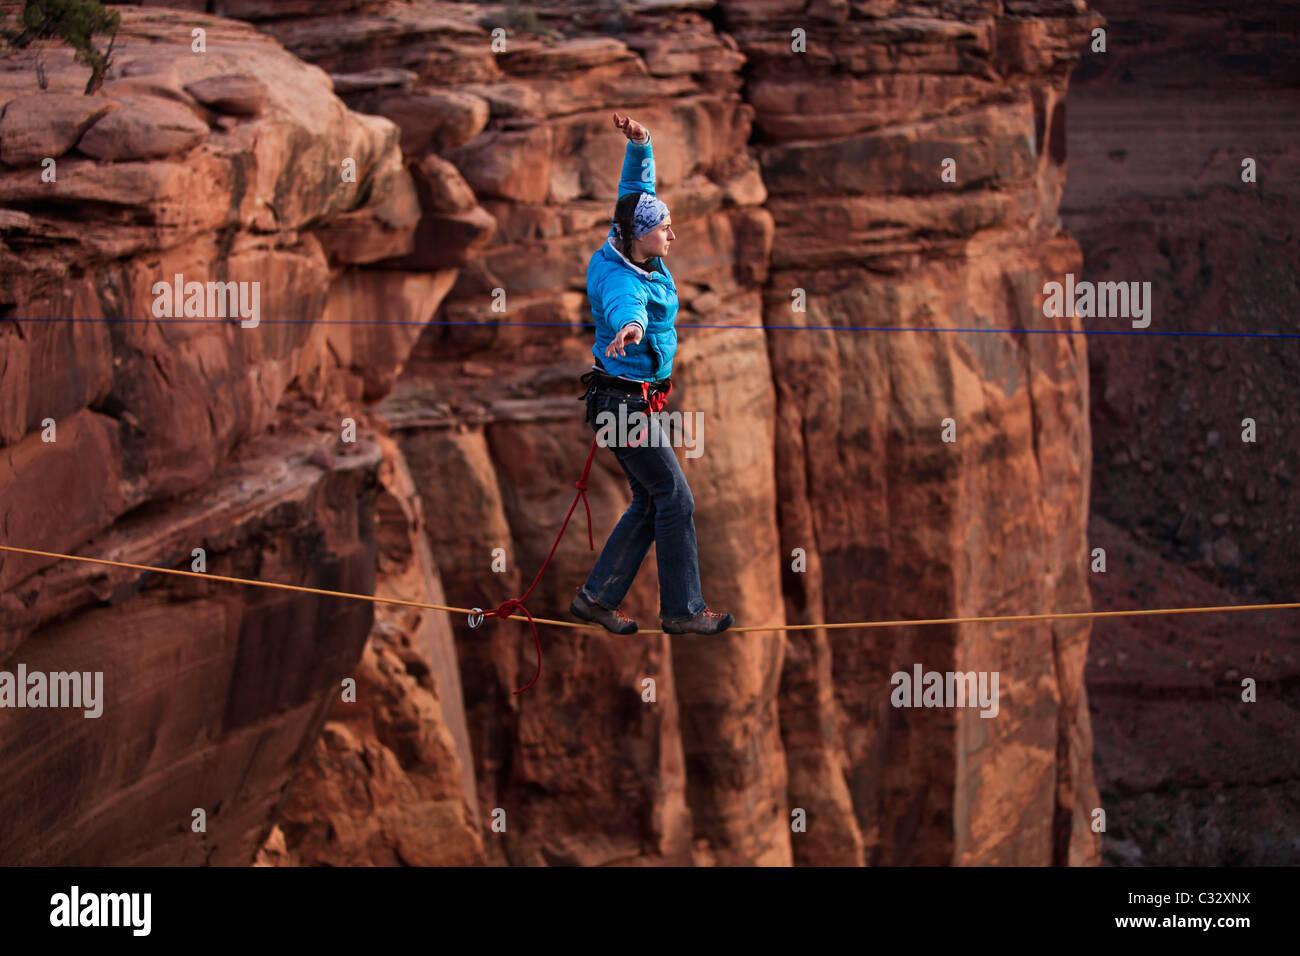 A female highliner walks across a highline at the Fruit Bowl in Moab, Utah, USA. - Stock Image